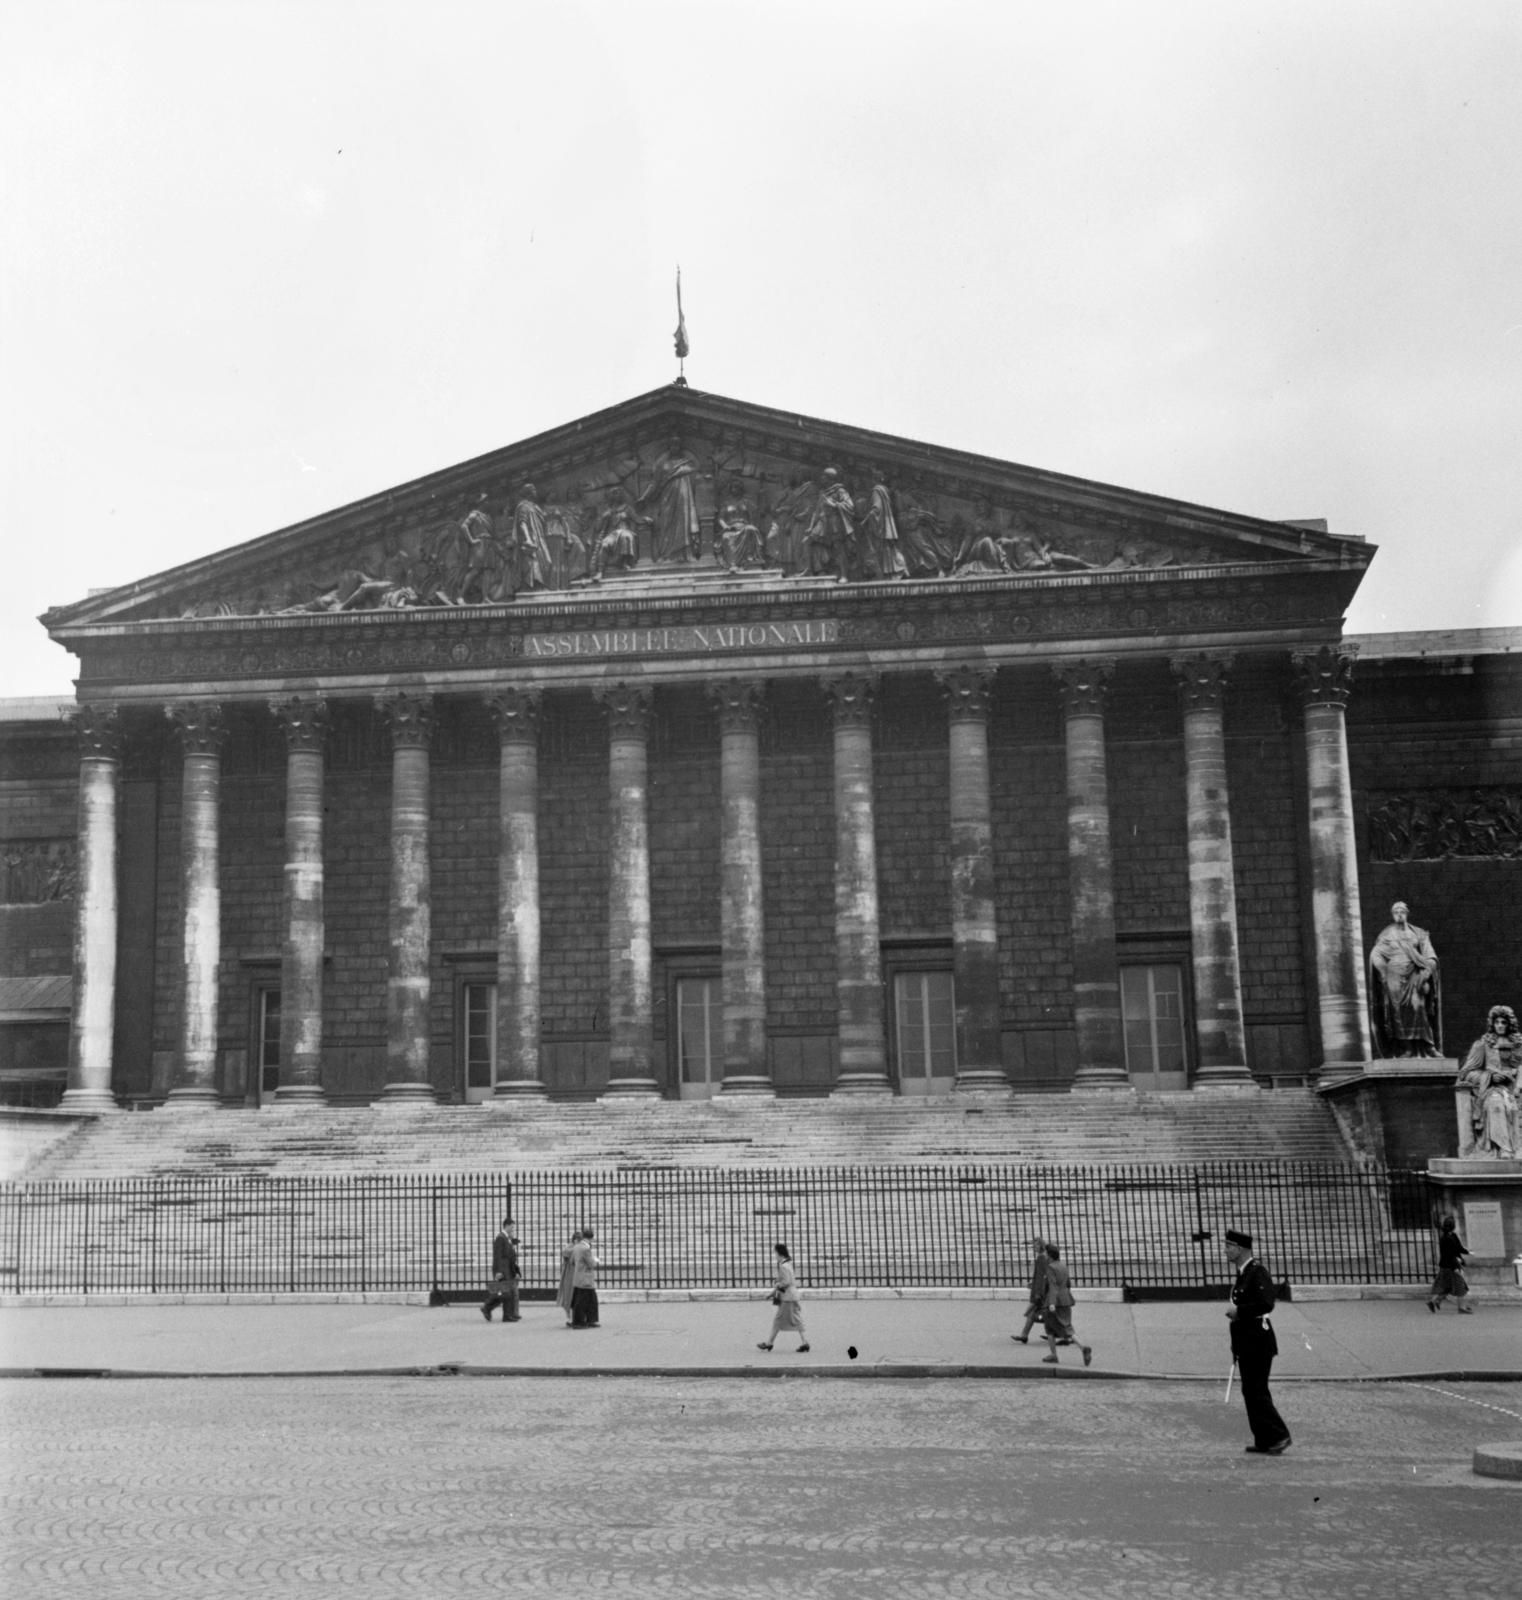 [Views of Paris - The Palais Bourbon]